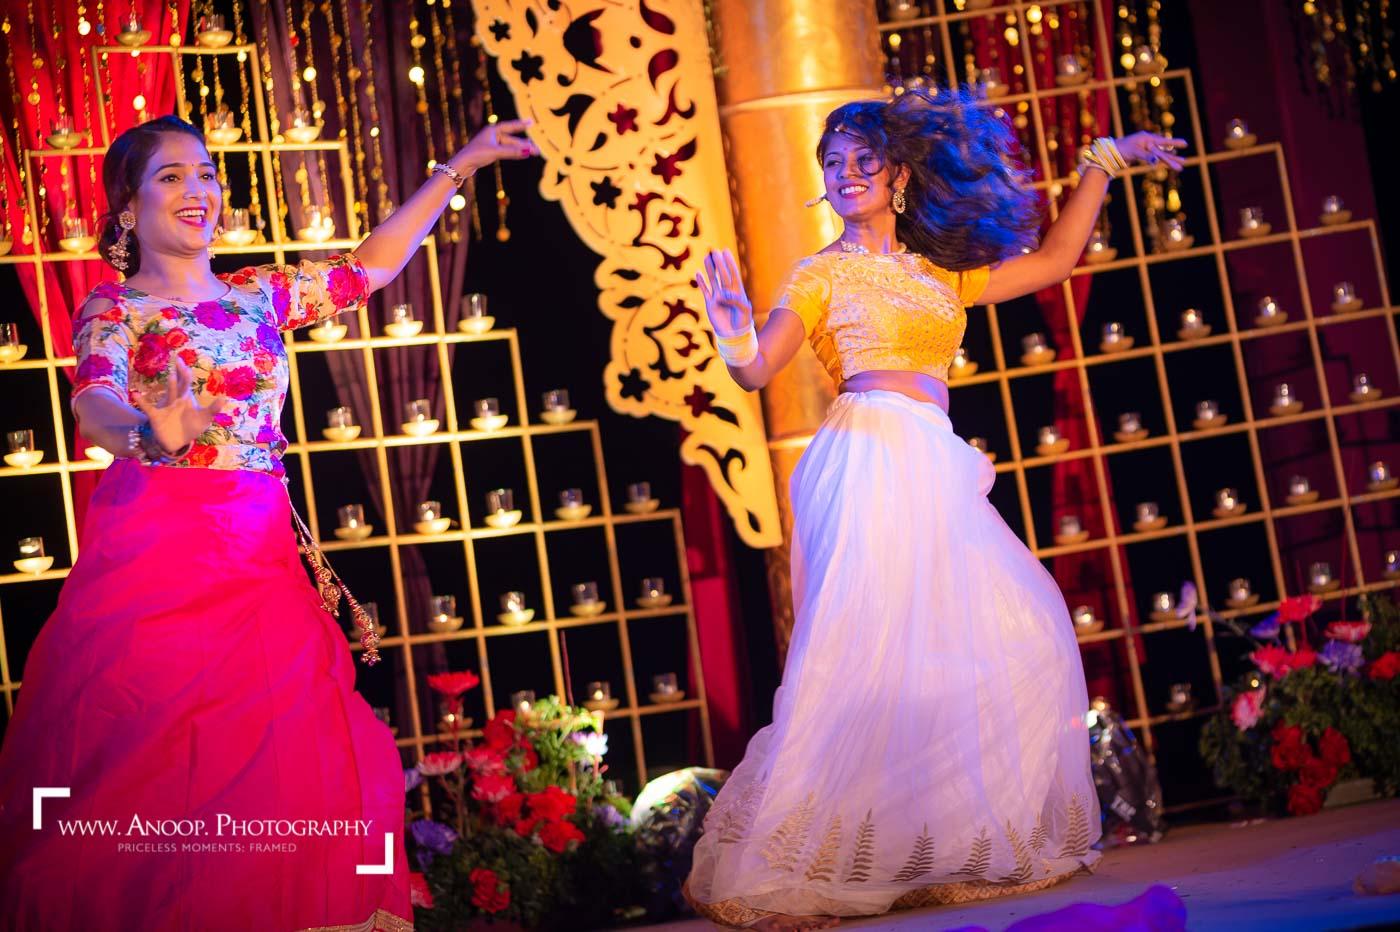 Destination-Nepali-Wedding-in-thailand-sheraton-hua-hin-018